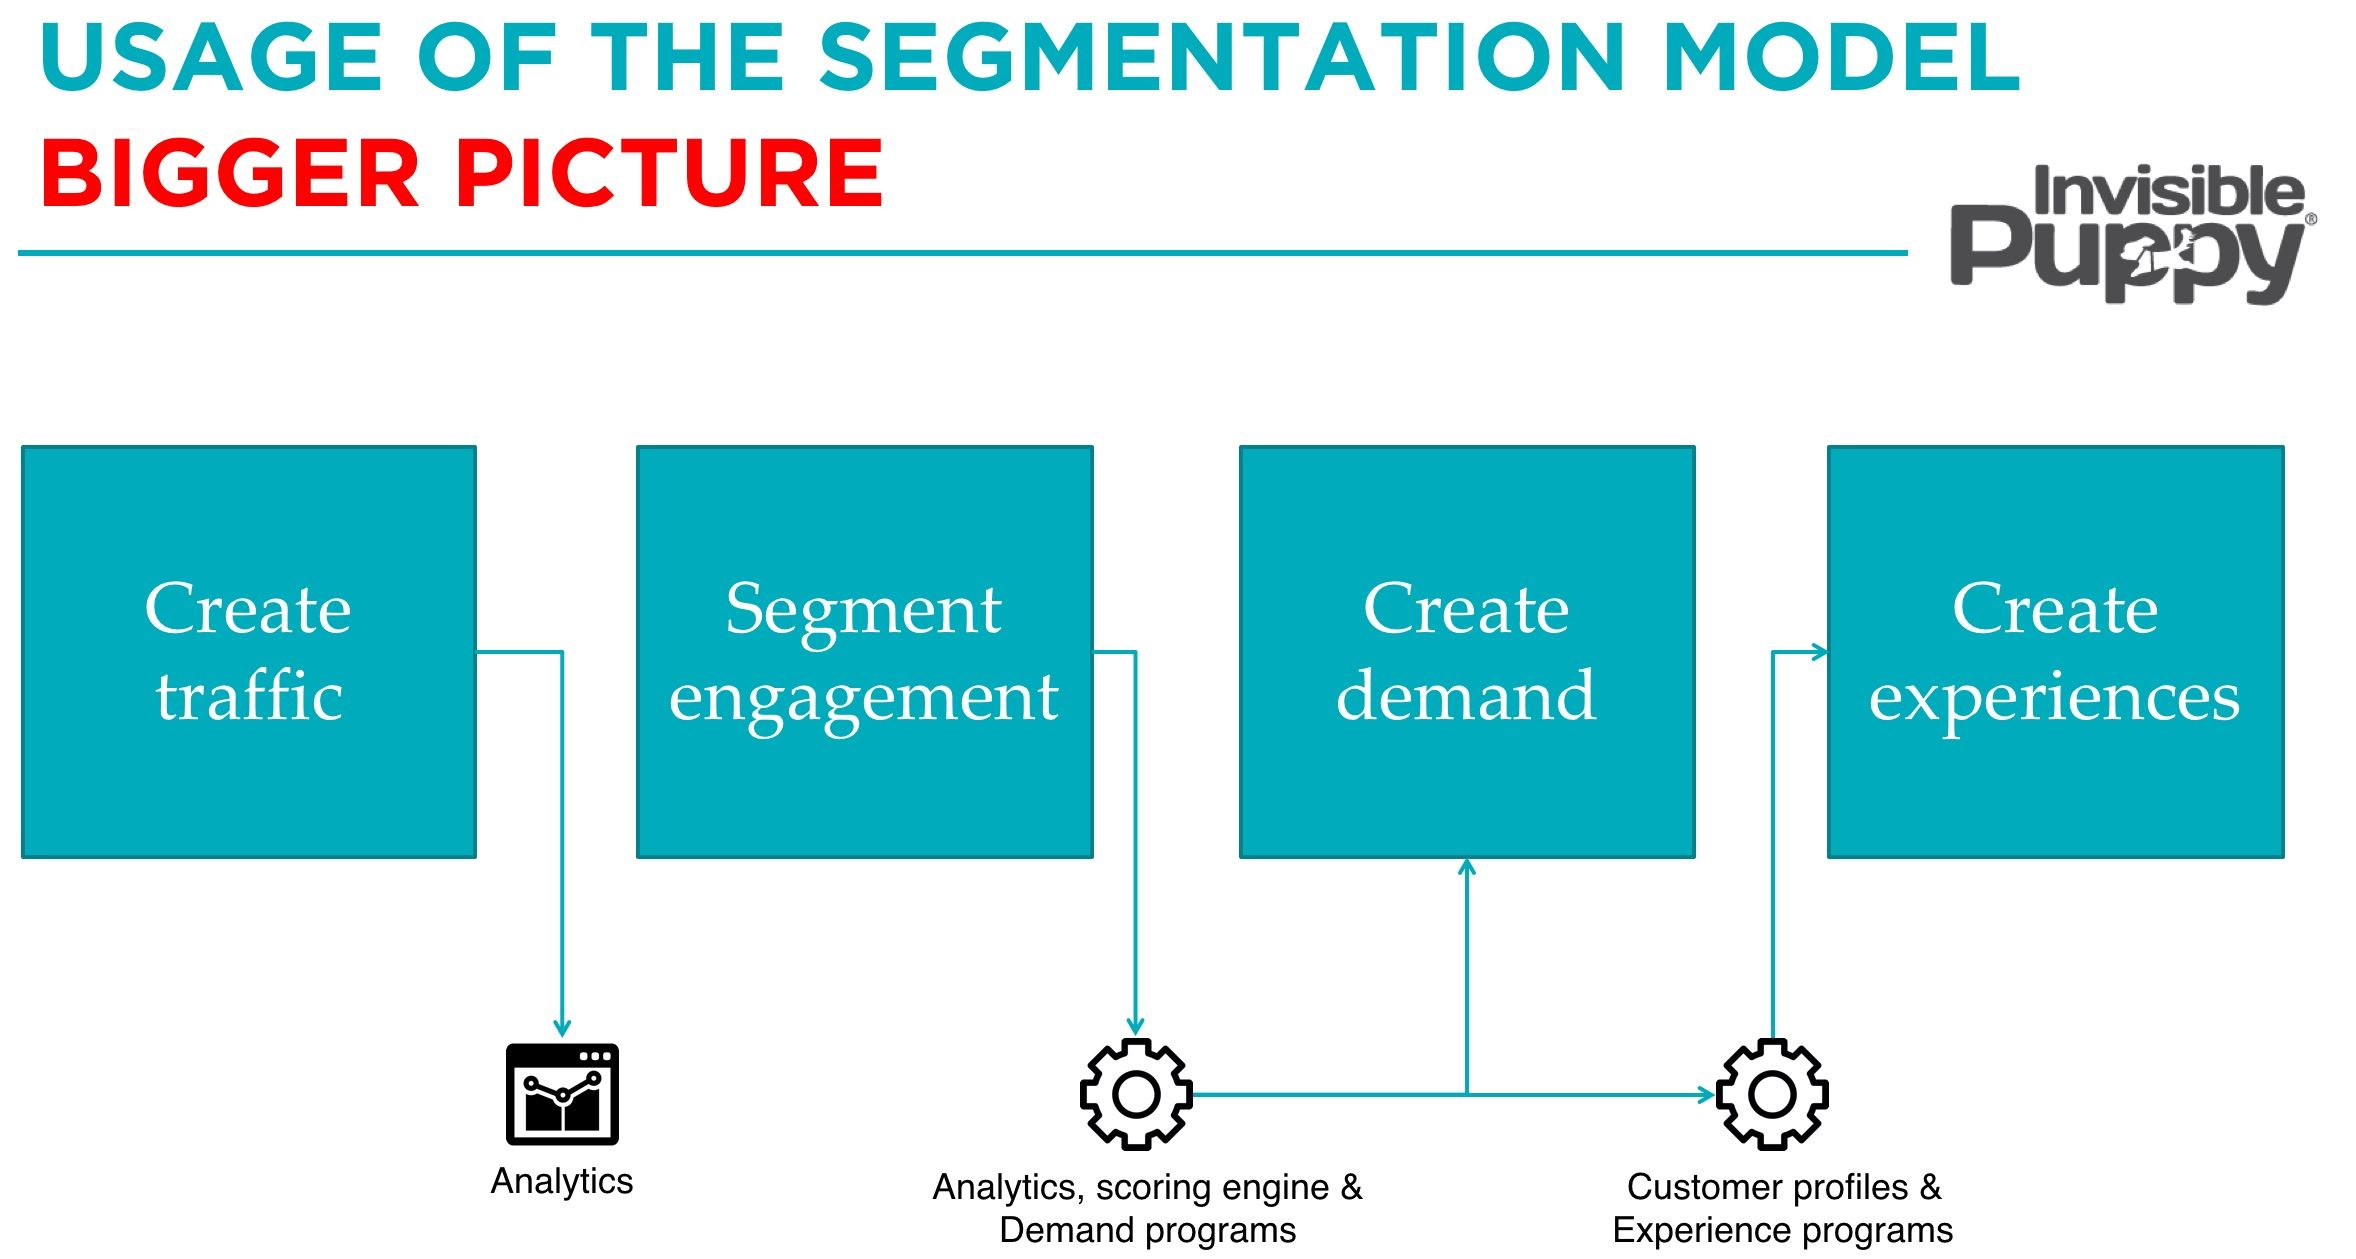 segmentation_model_how_to_personalization